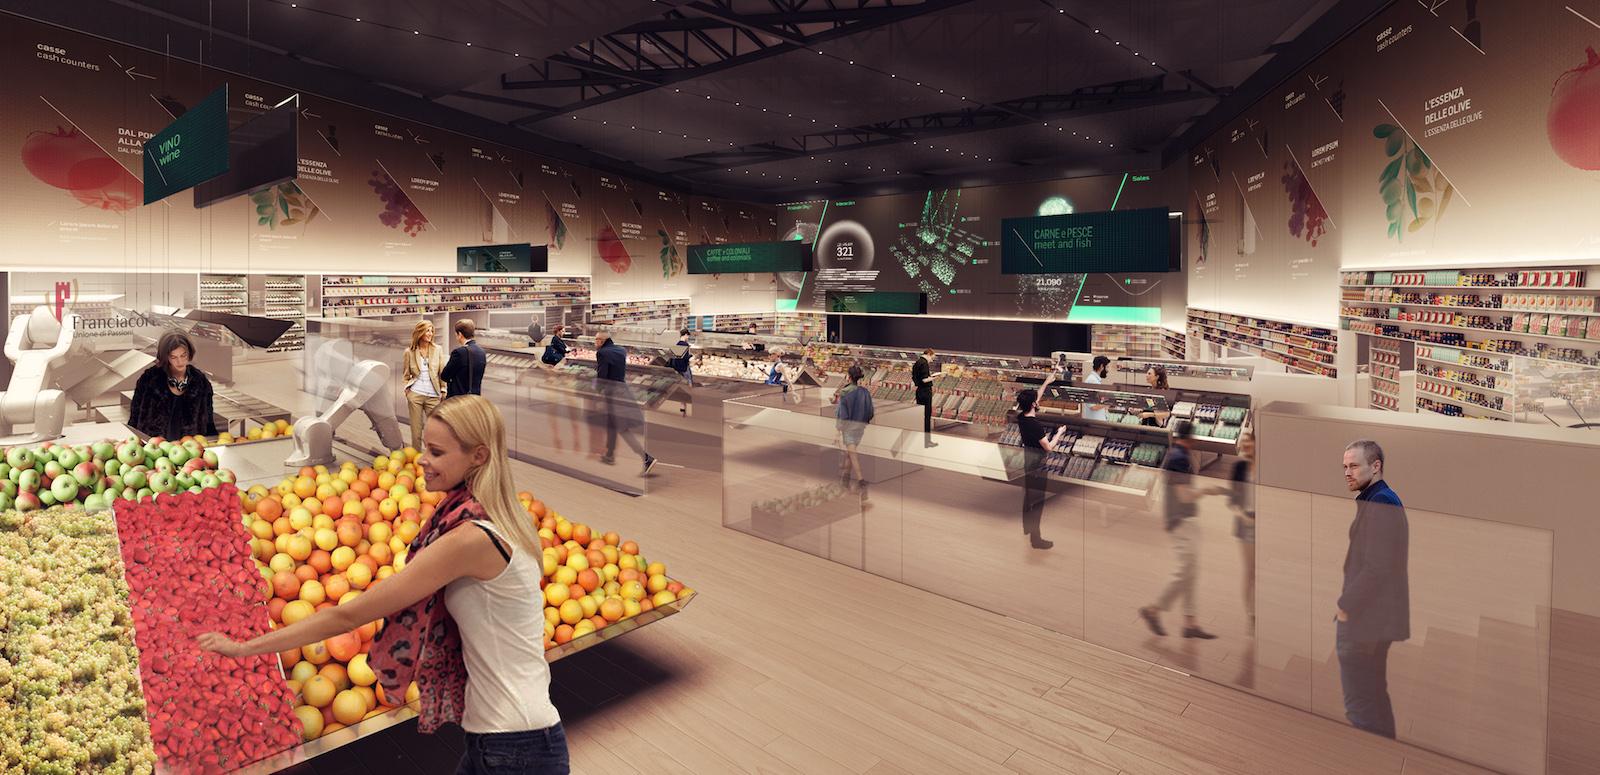 Carlo Ratti - Future food District